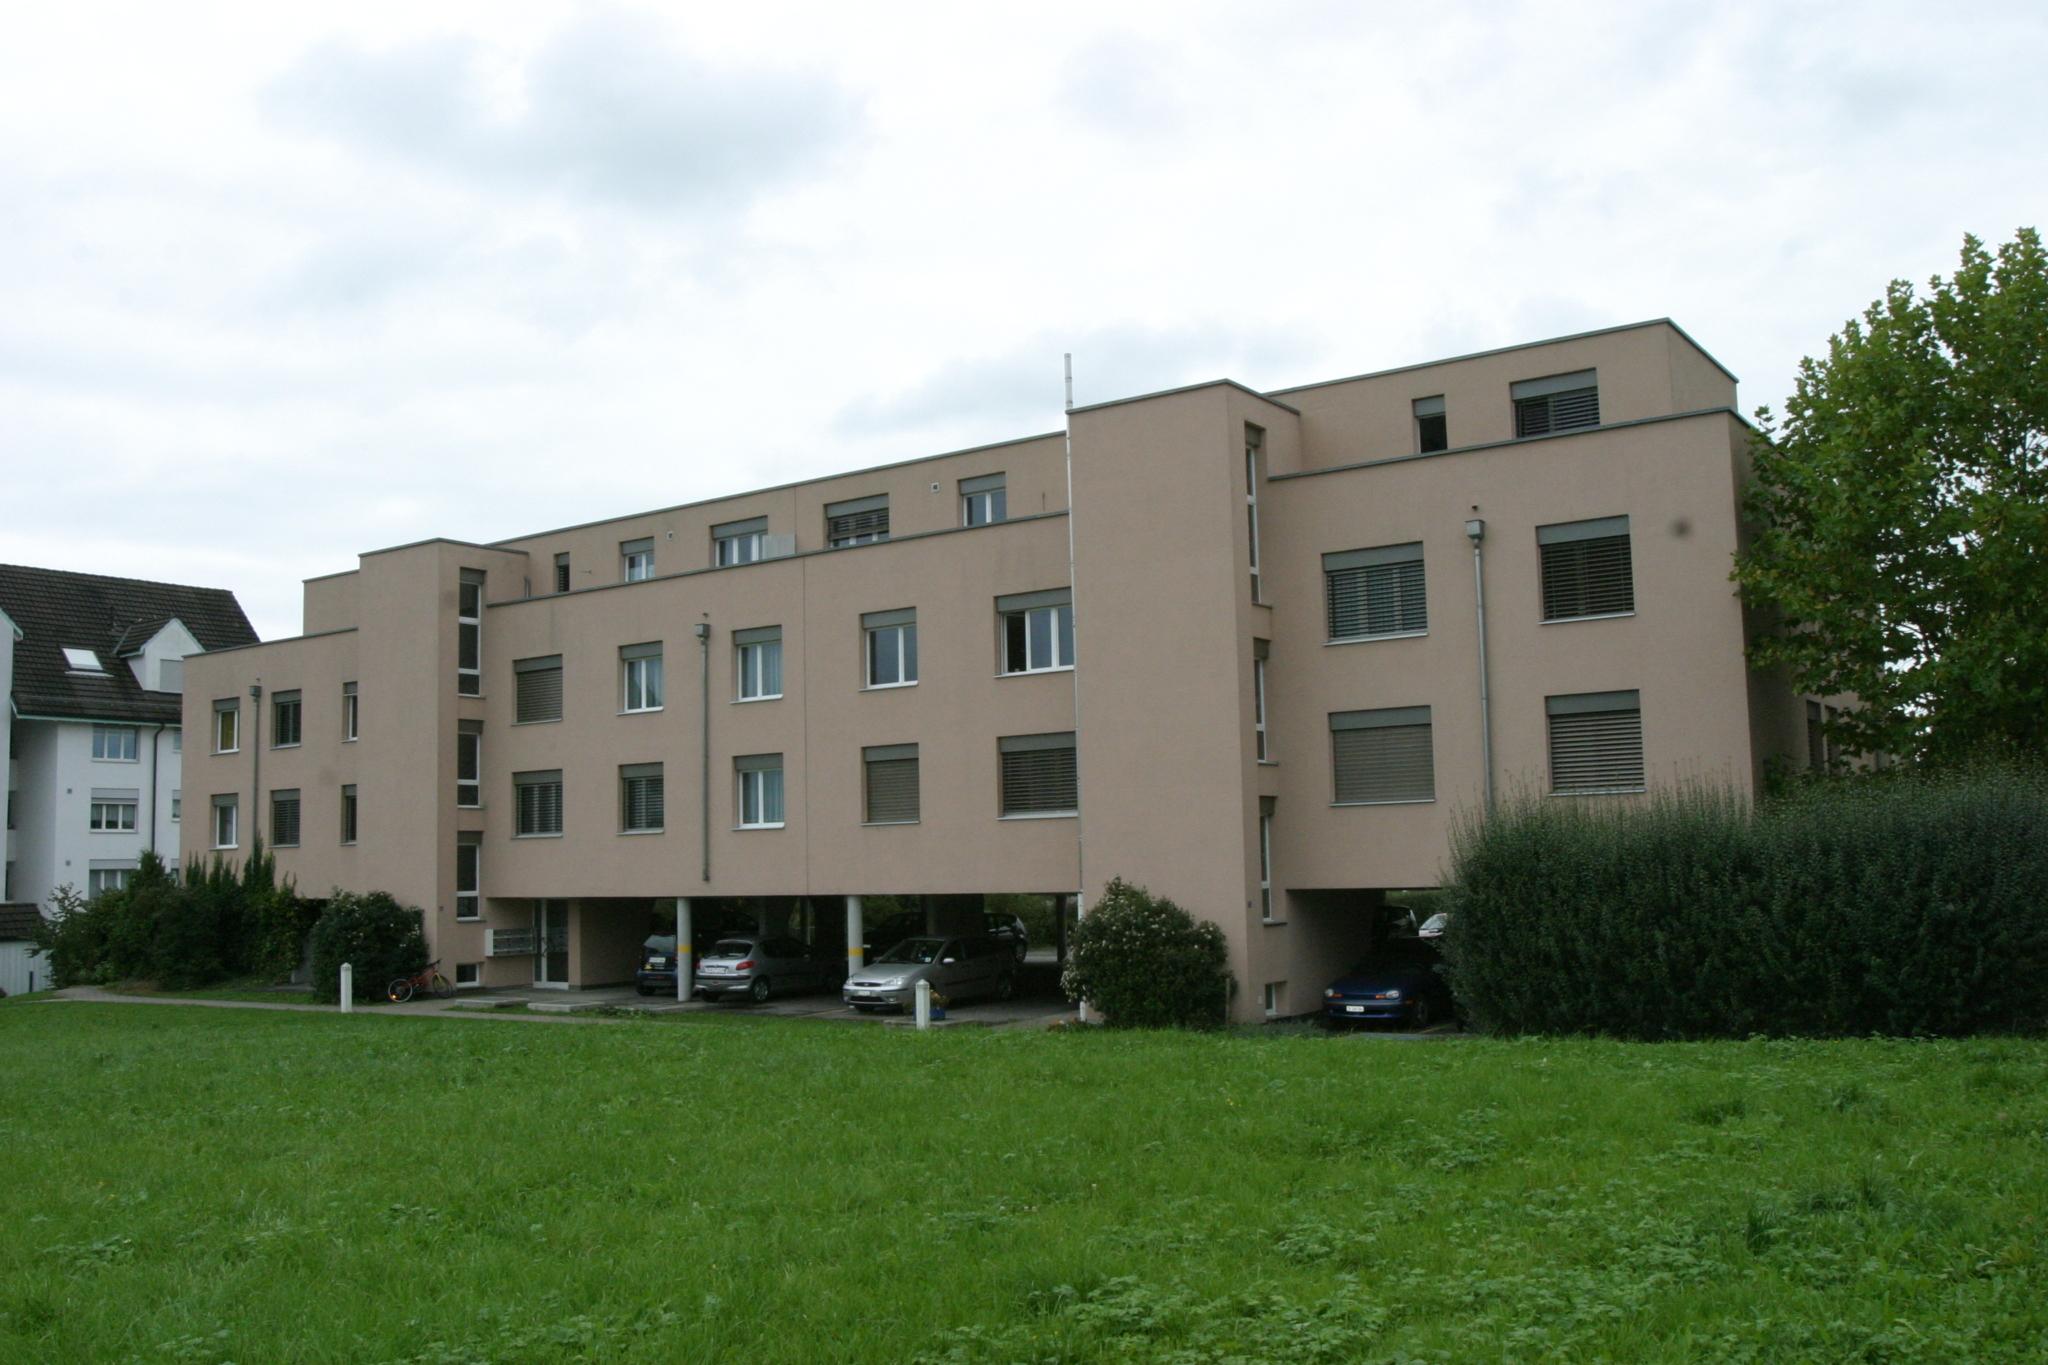 12-Familienhaus in Romanshorn